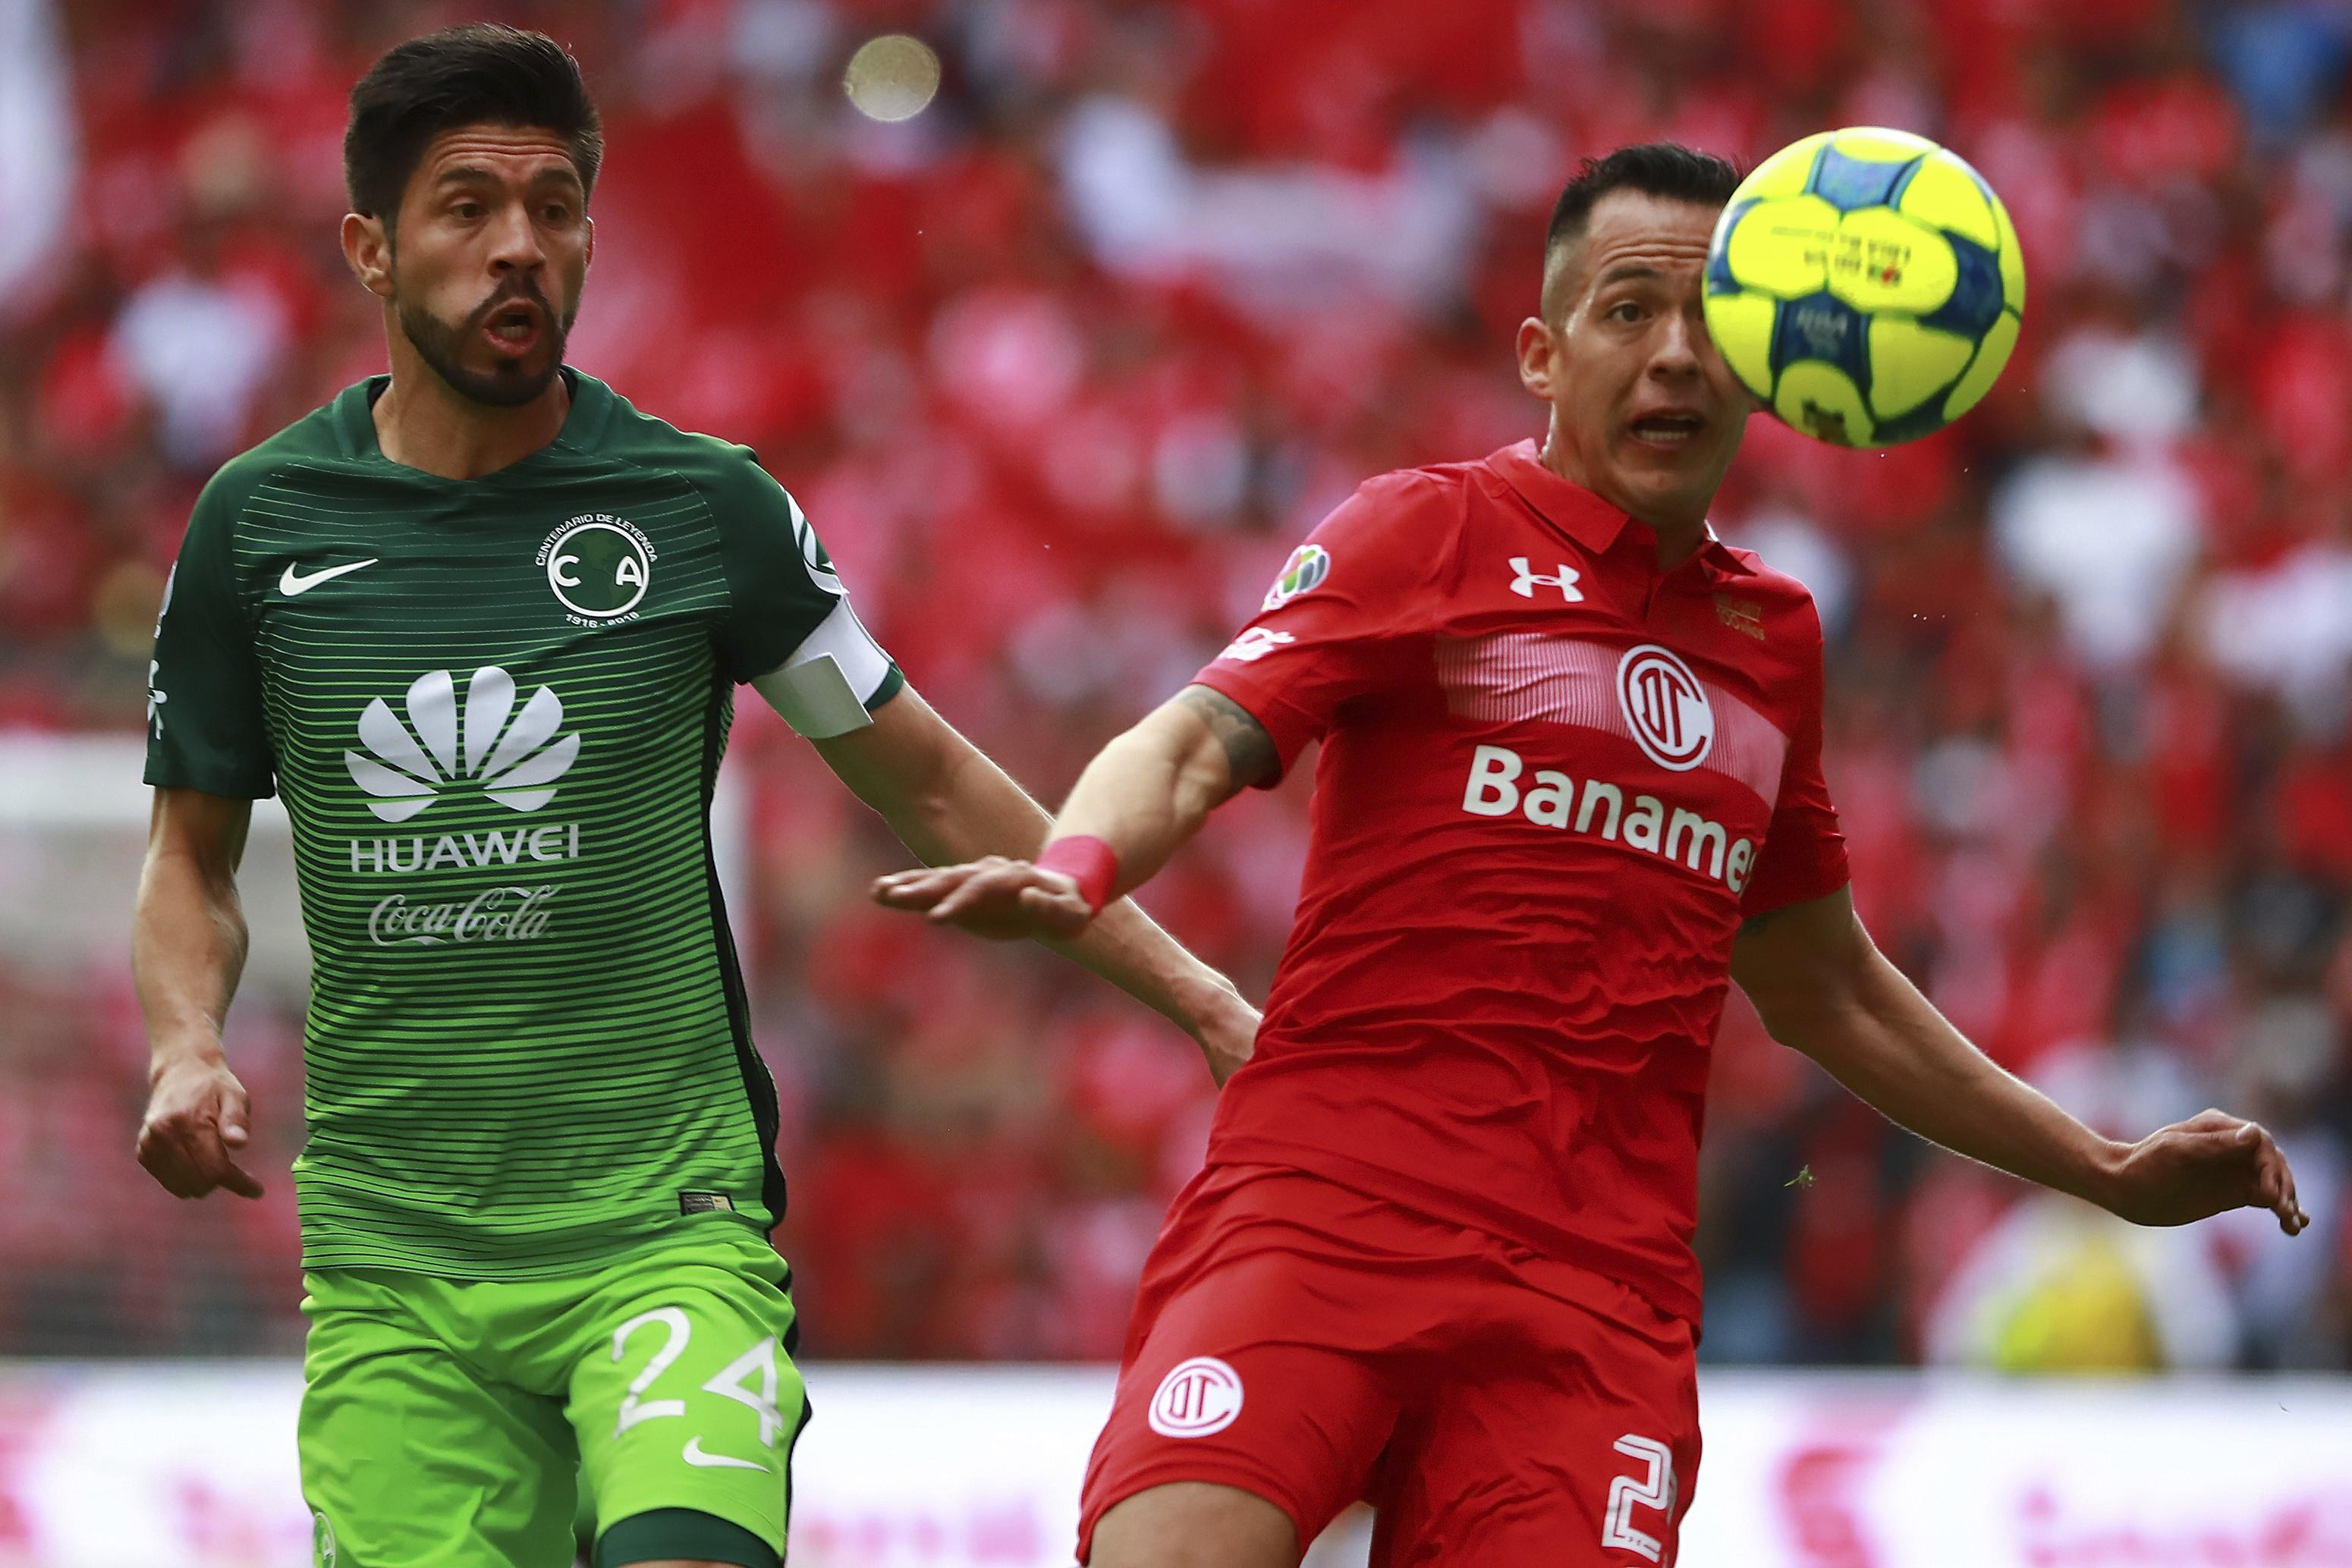 Cruz Azul Refuerzo Clausura 2019 Rodrigo Salinas Los Pleyers